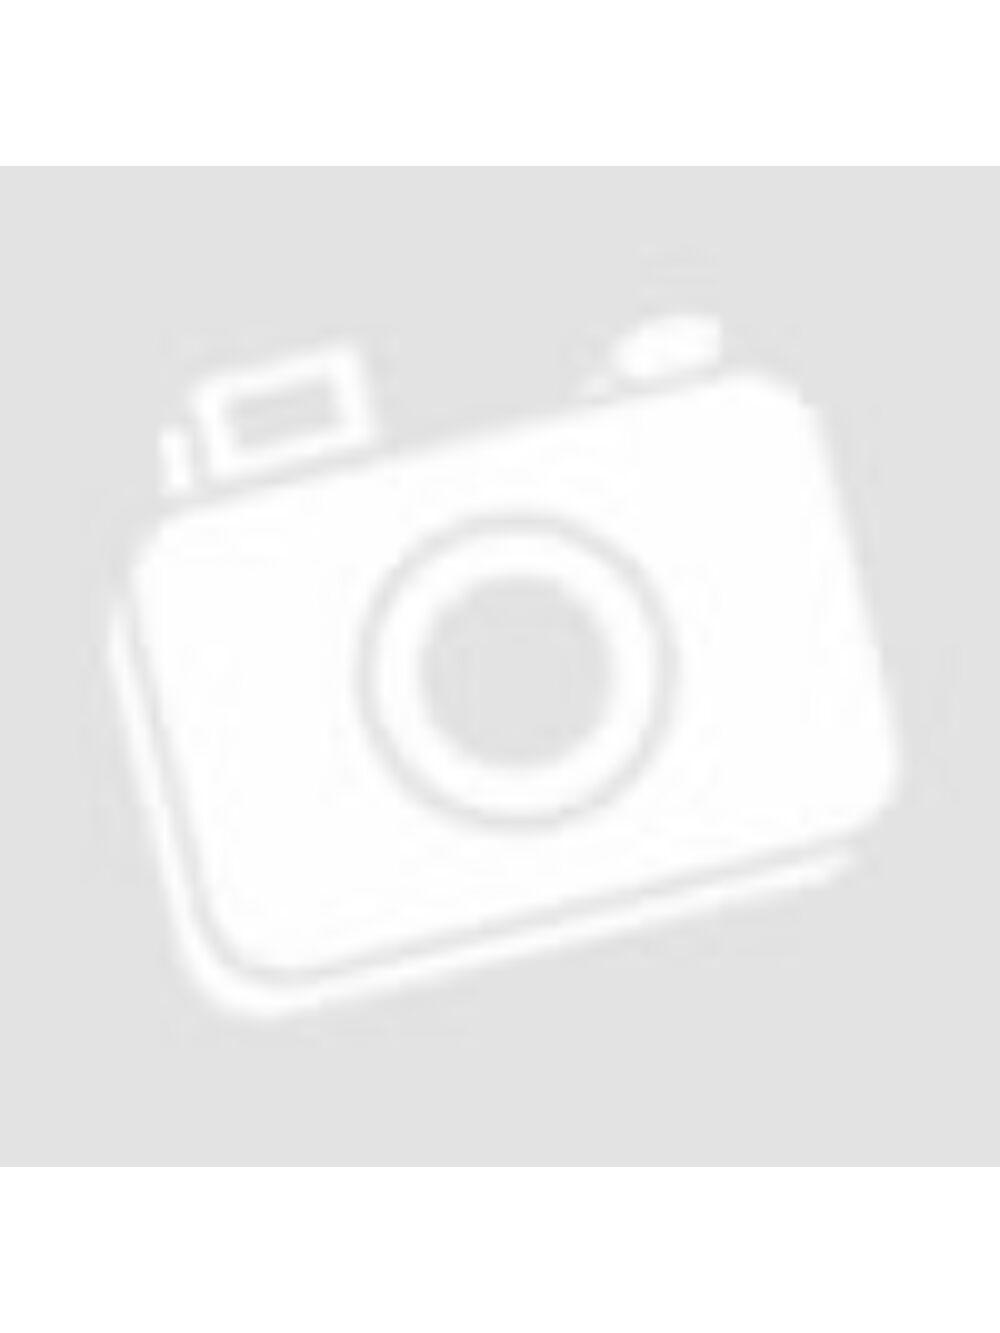 Filc öntapi virág - Zöld-Rószaszín